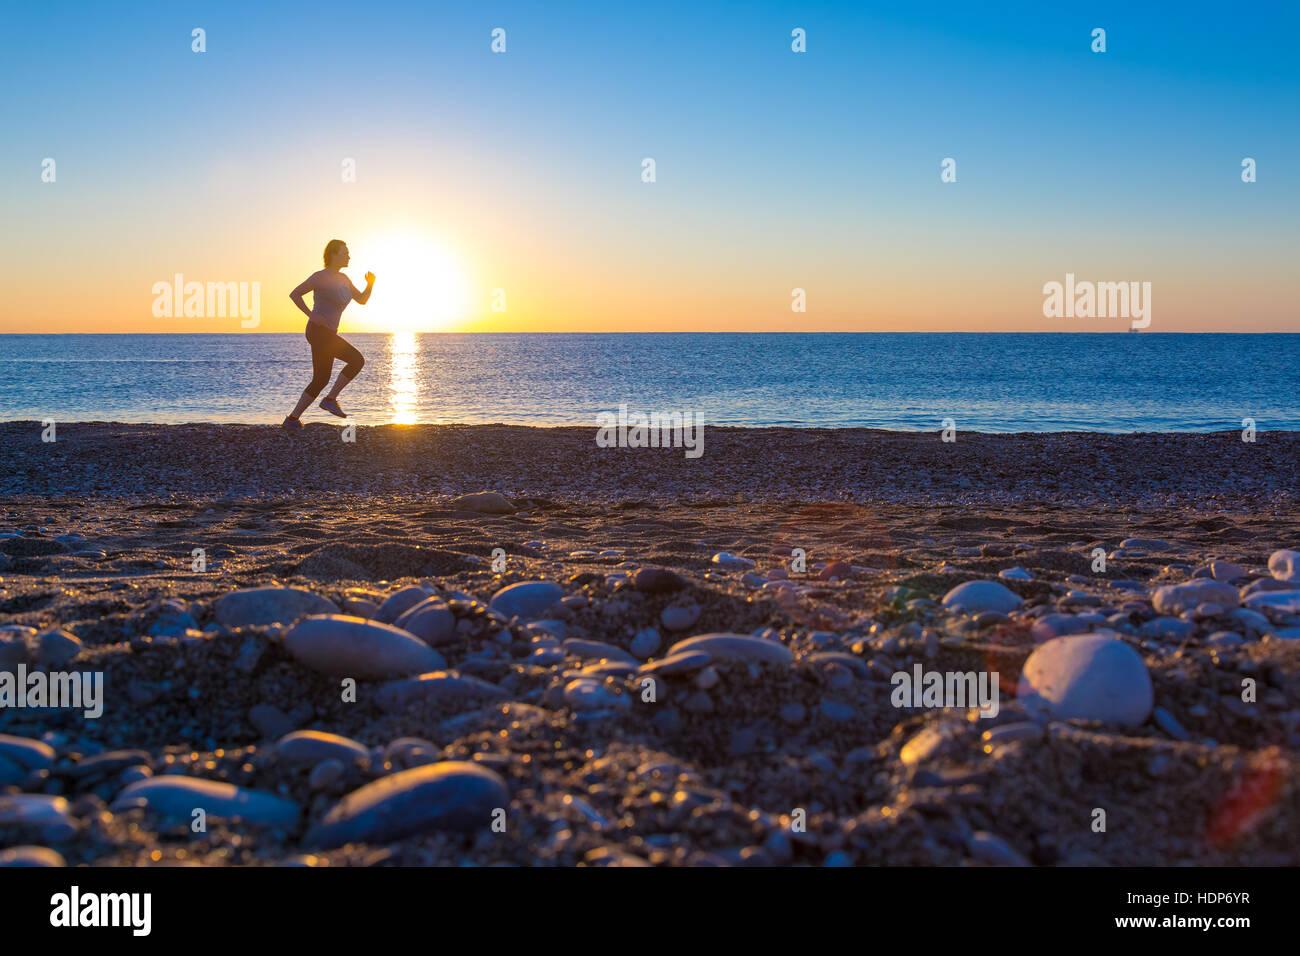 Silueta de Sportswoman en la playa al amanecer. Imagen De Stock